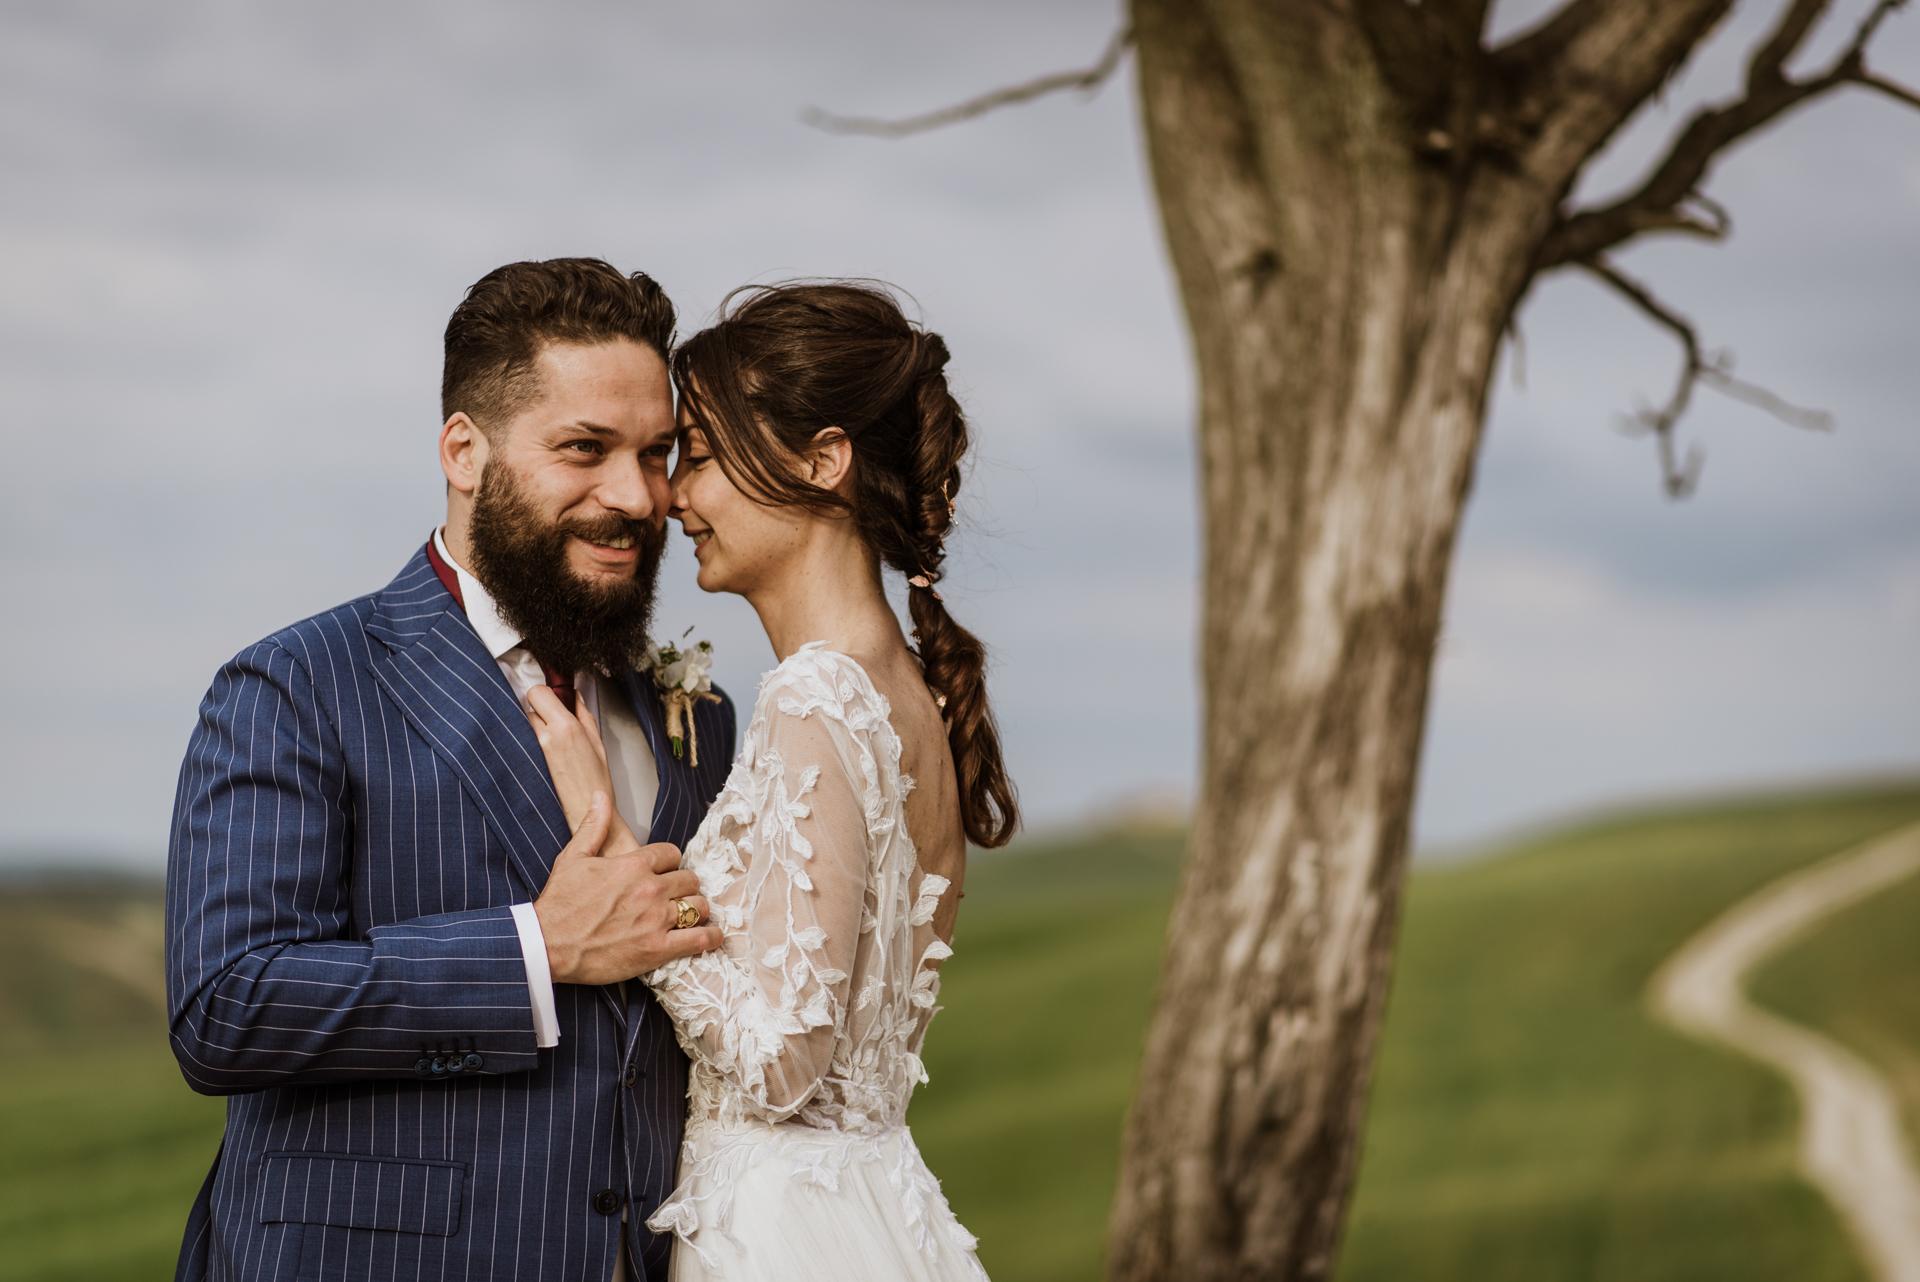 Fotografo Matrimonio Siena Marco Vegni